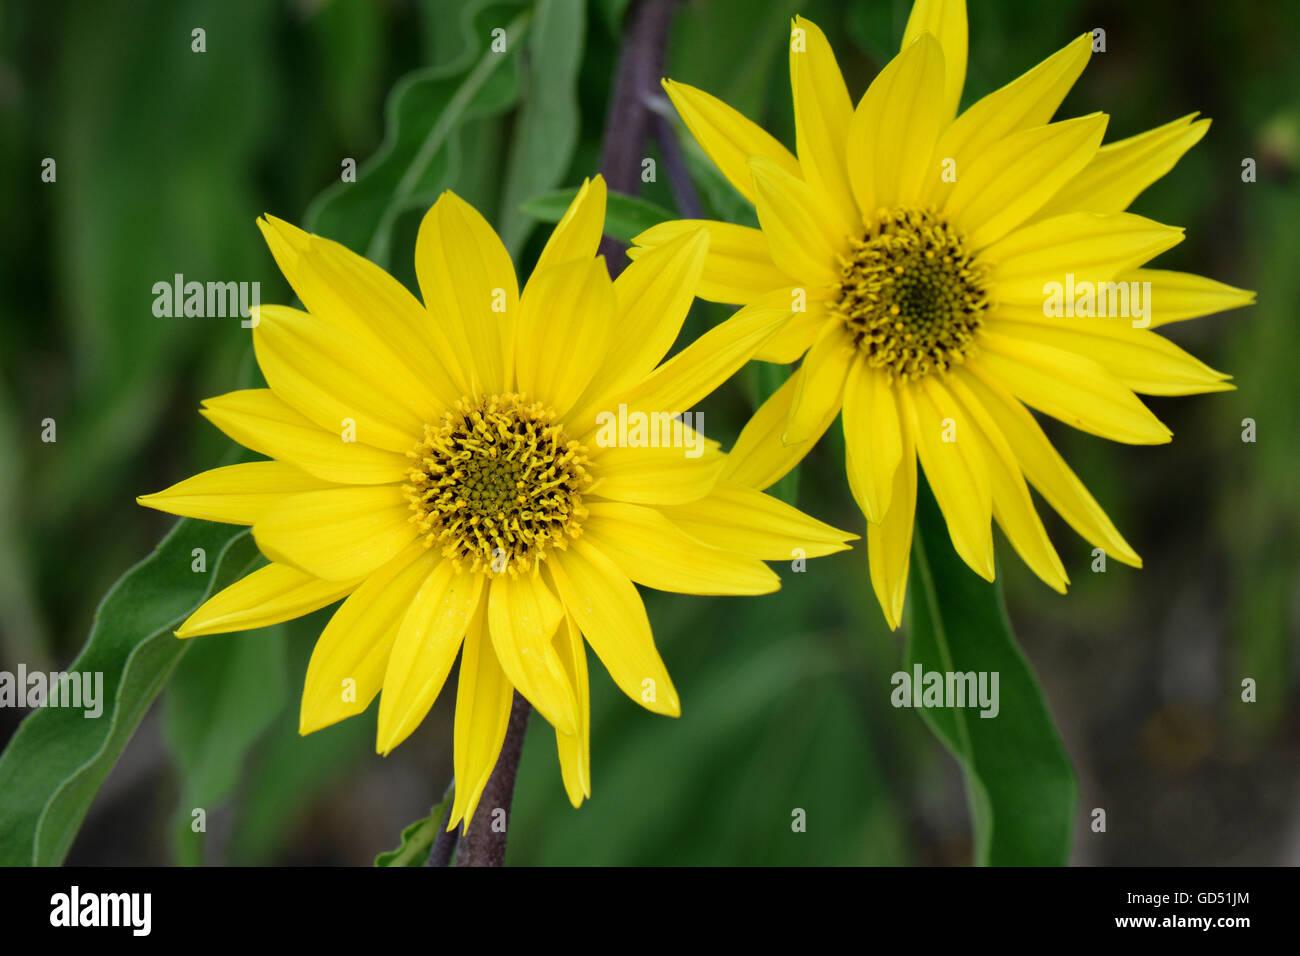 Maximilians Sonnenblume, Helianthus maximiliani - Stock Image